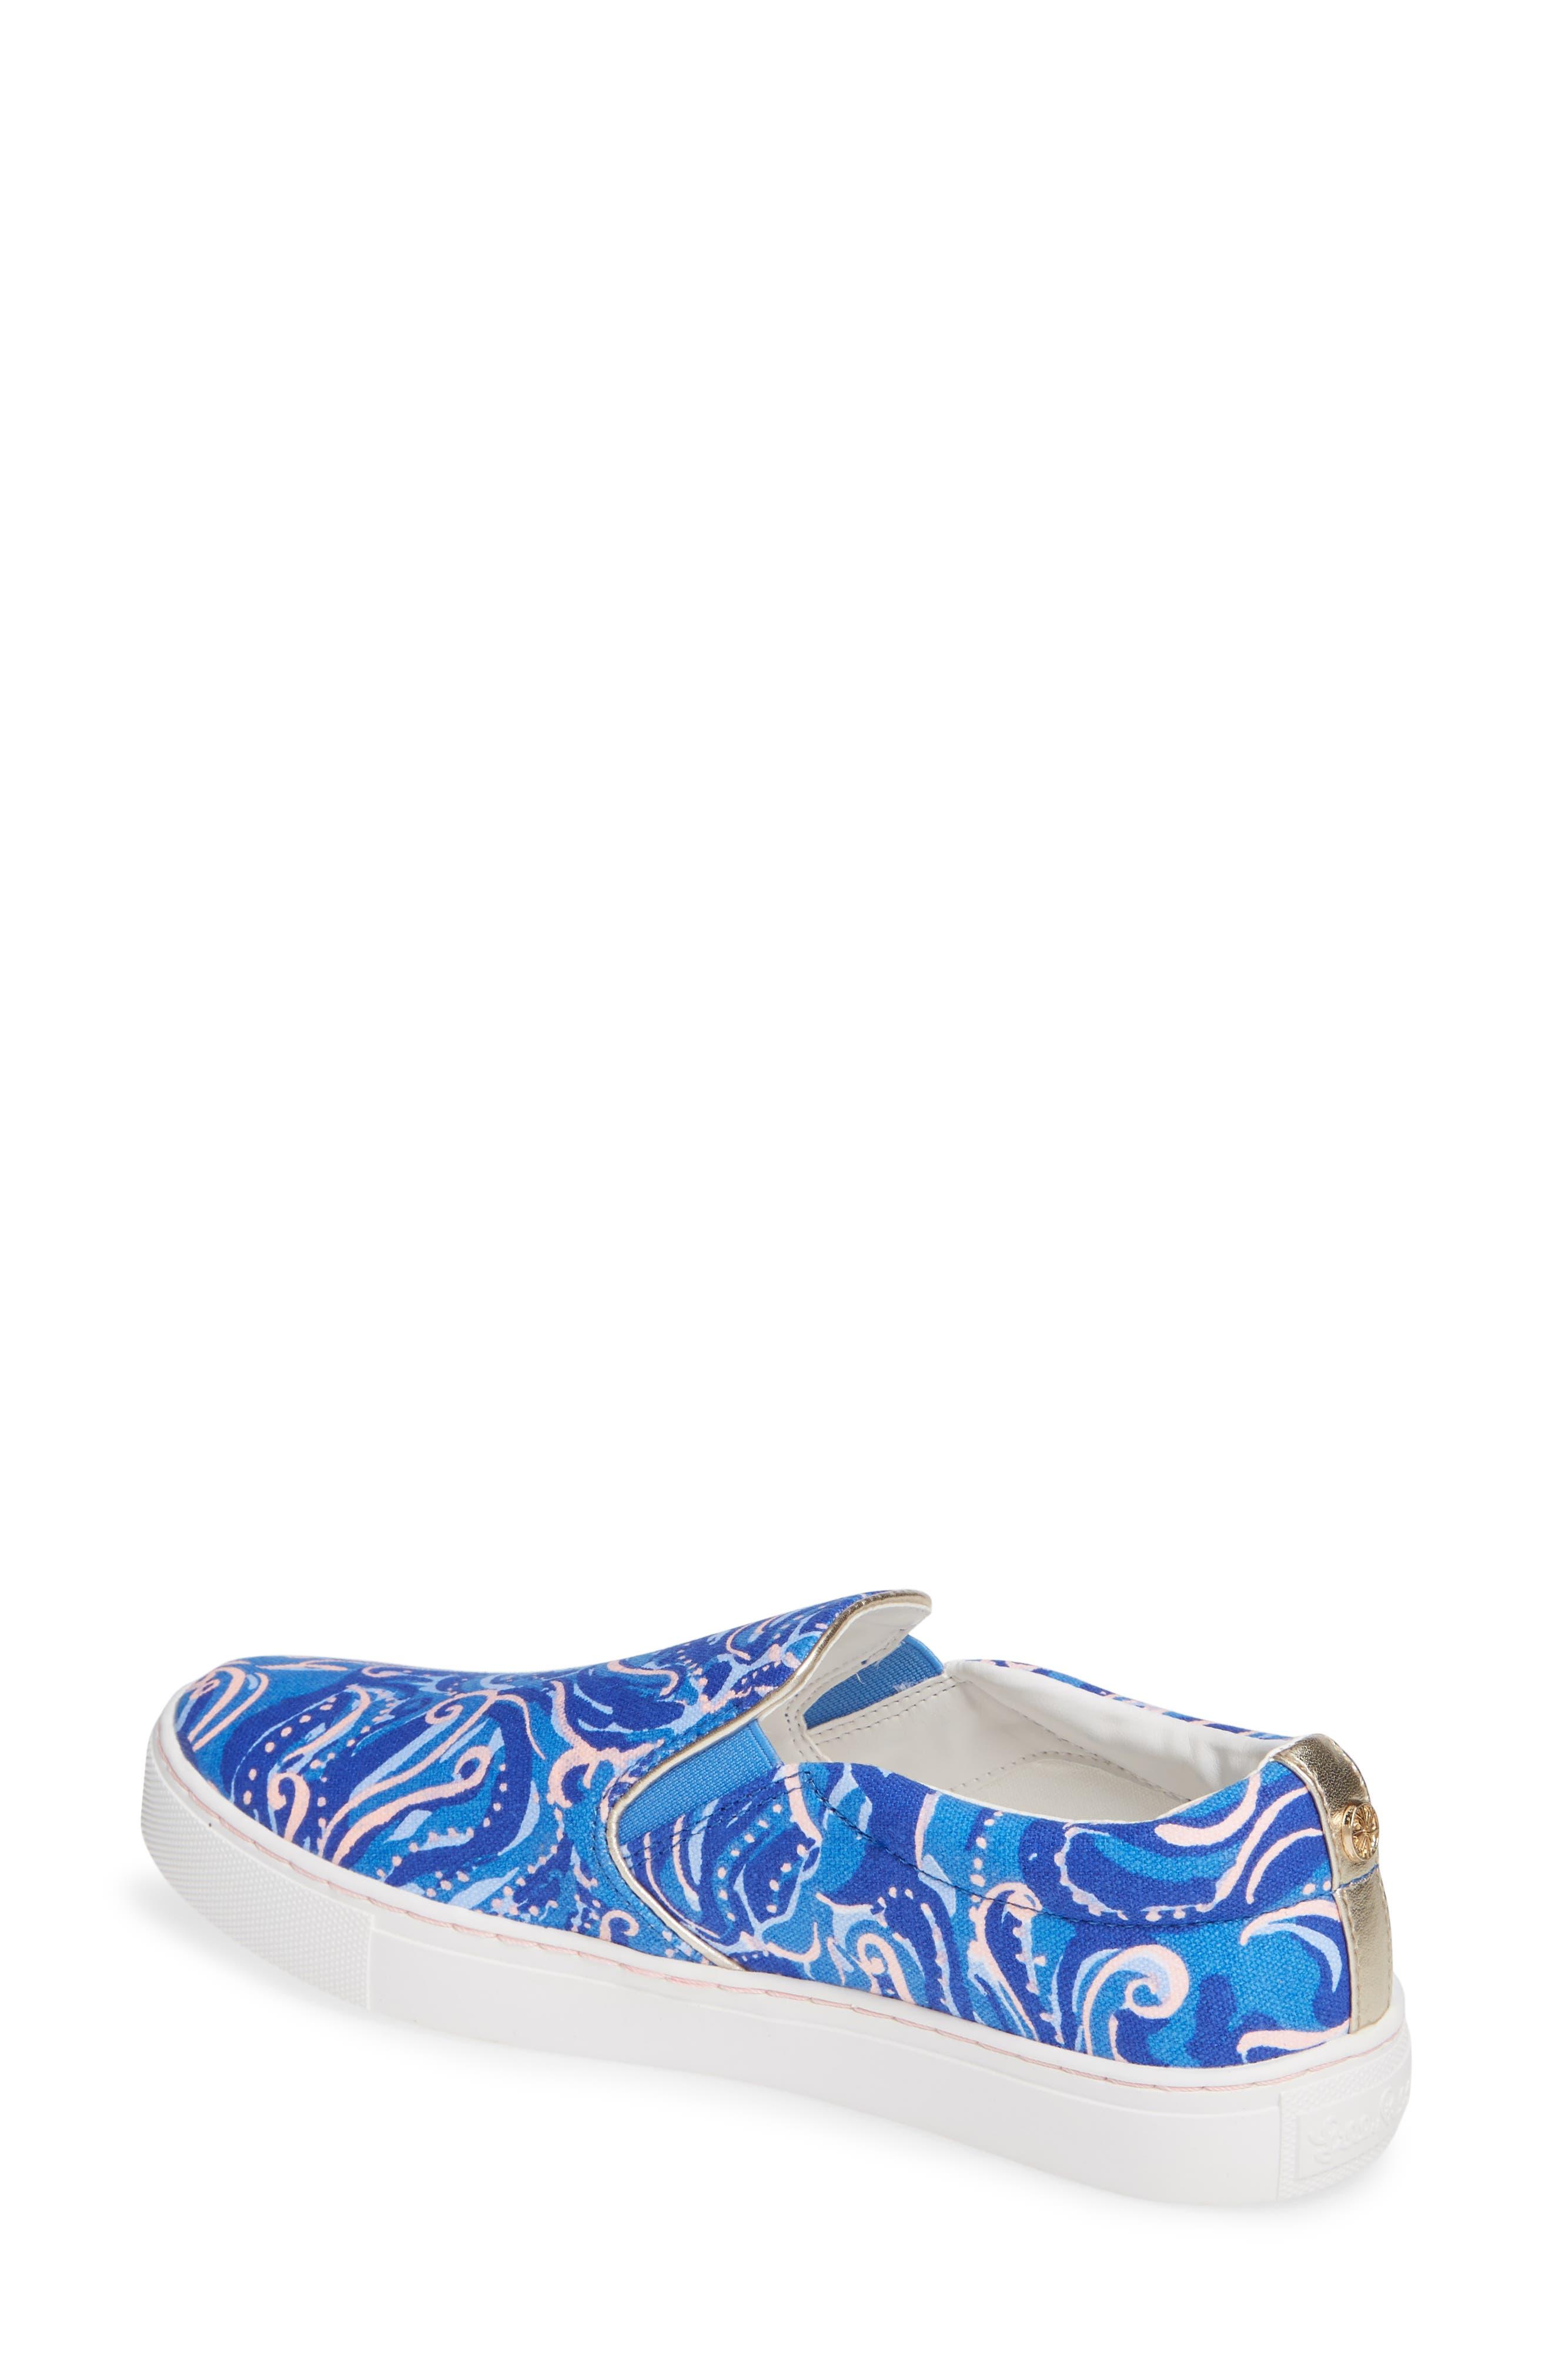 Julie Sneaker,                             Alternate thumbnail 2, color,                             COASTAL BLUE